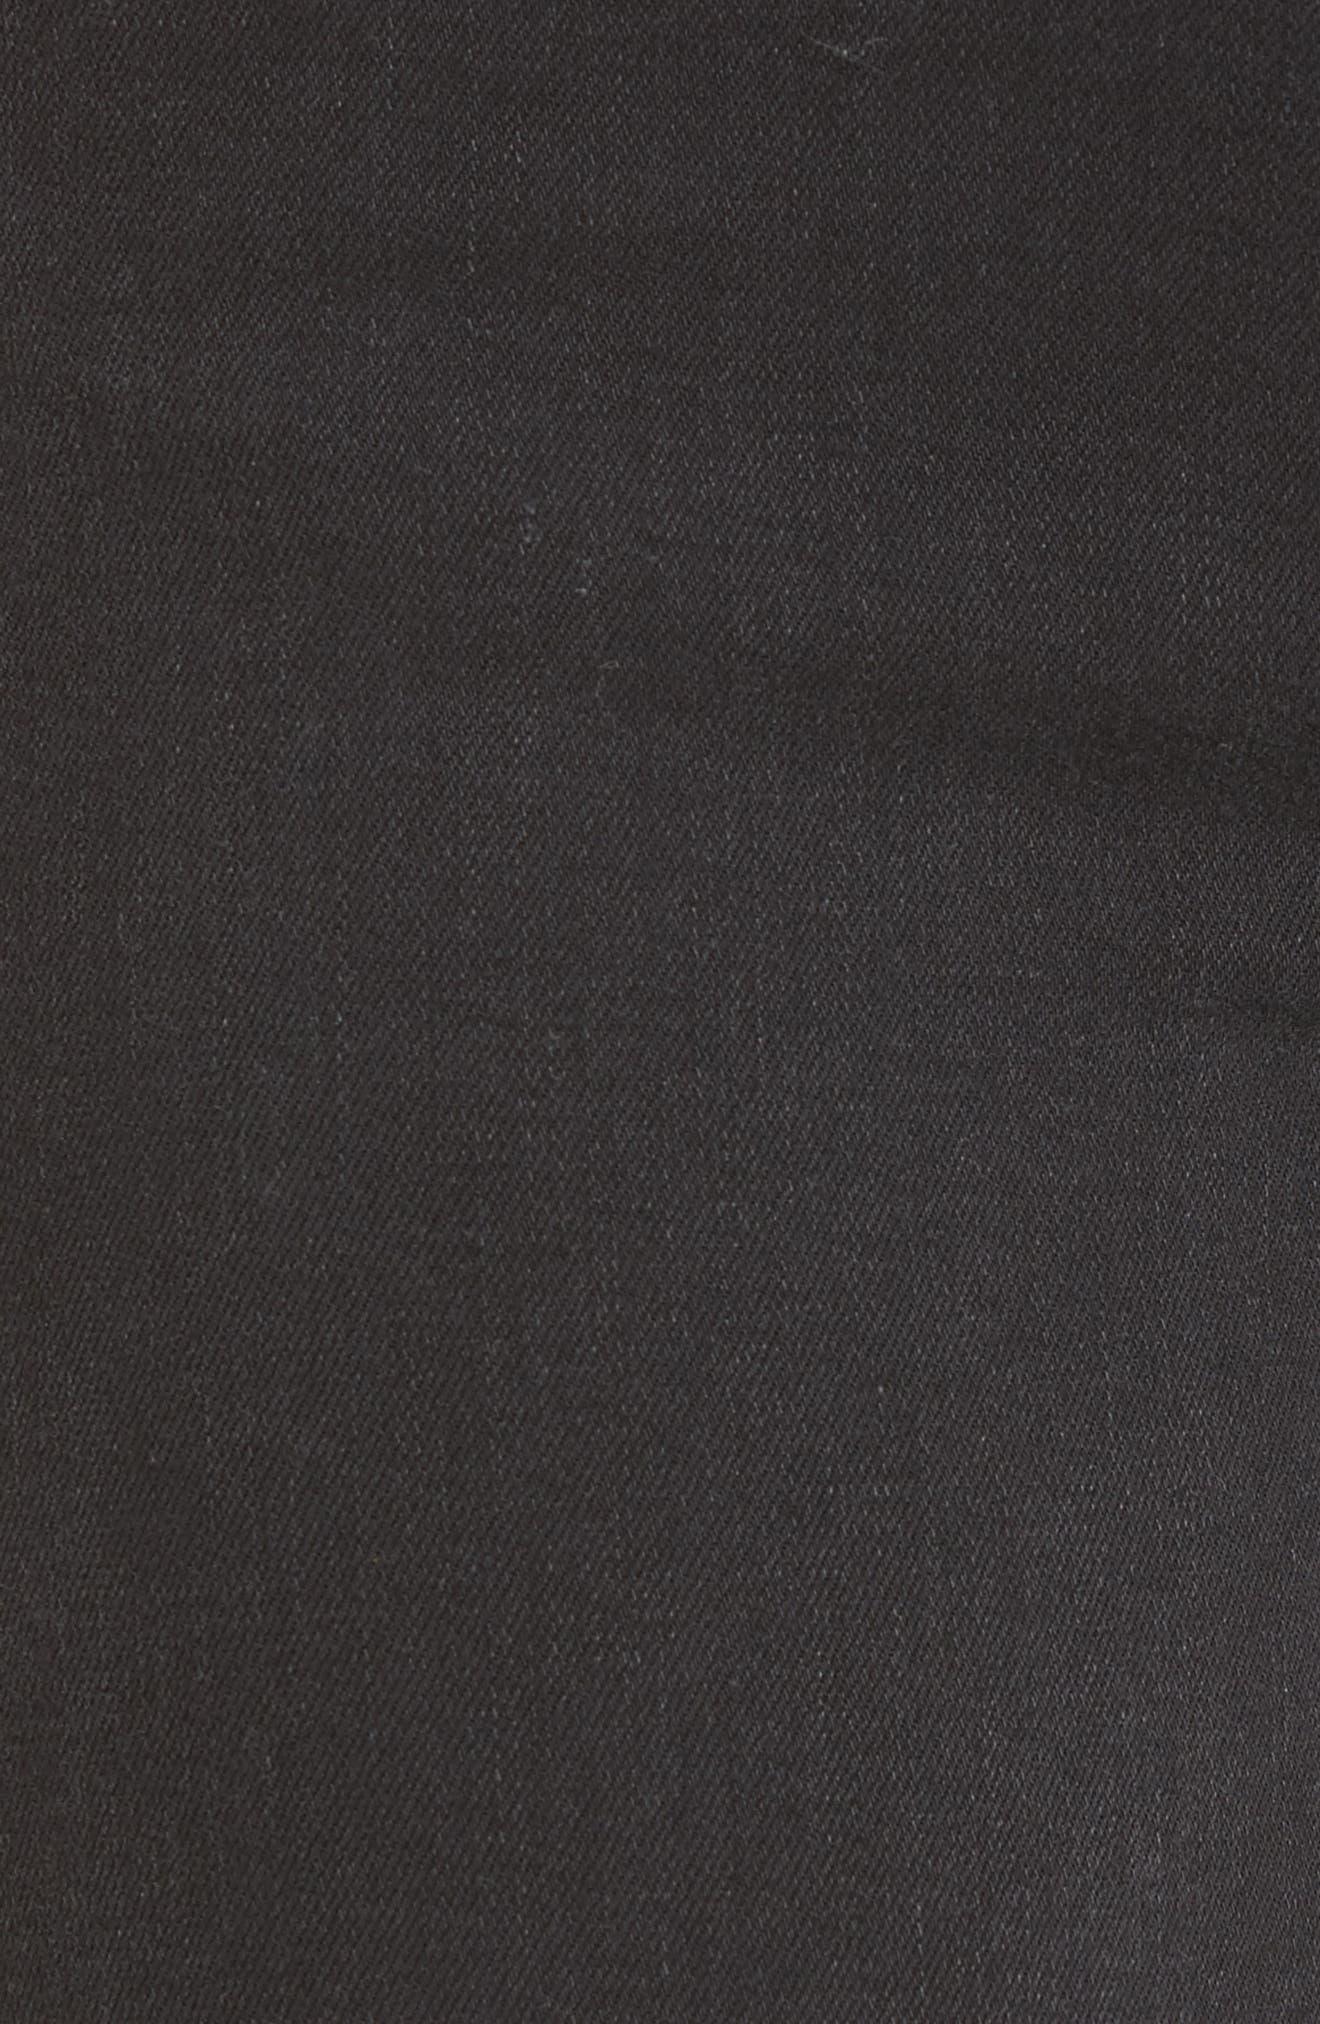 Transcend - Verdugo Ankle Skinny Jeans,                             Alternate thumbnail 6, color,                             001